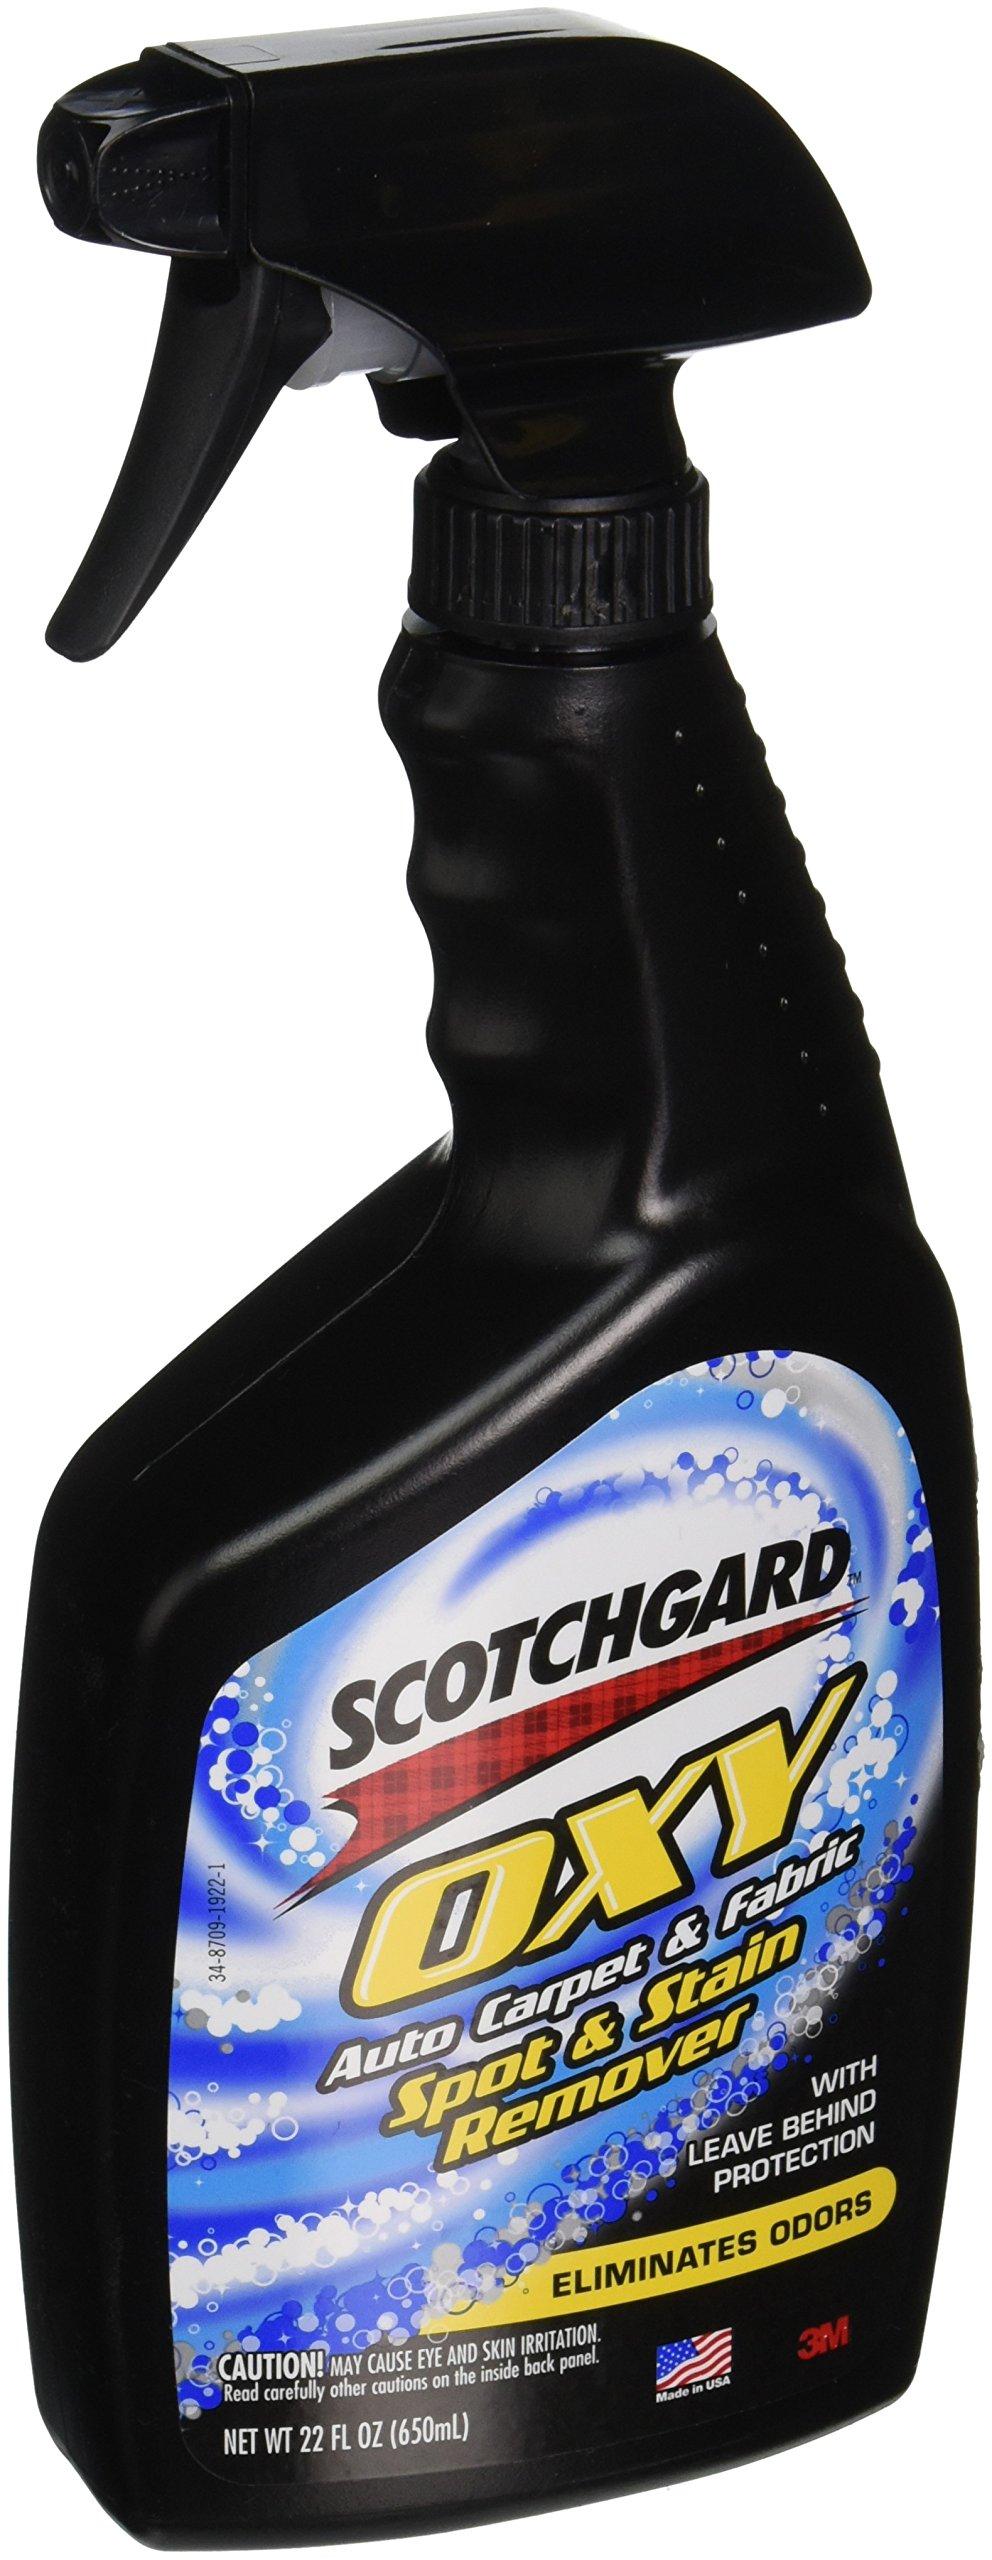 Cheap Carpet Scotchgard Find Carpet Scotchgard Deals On